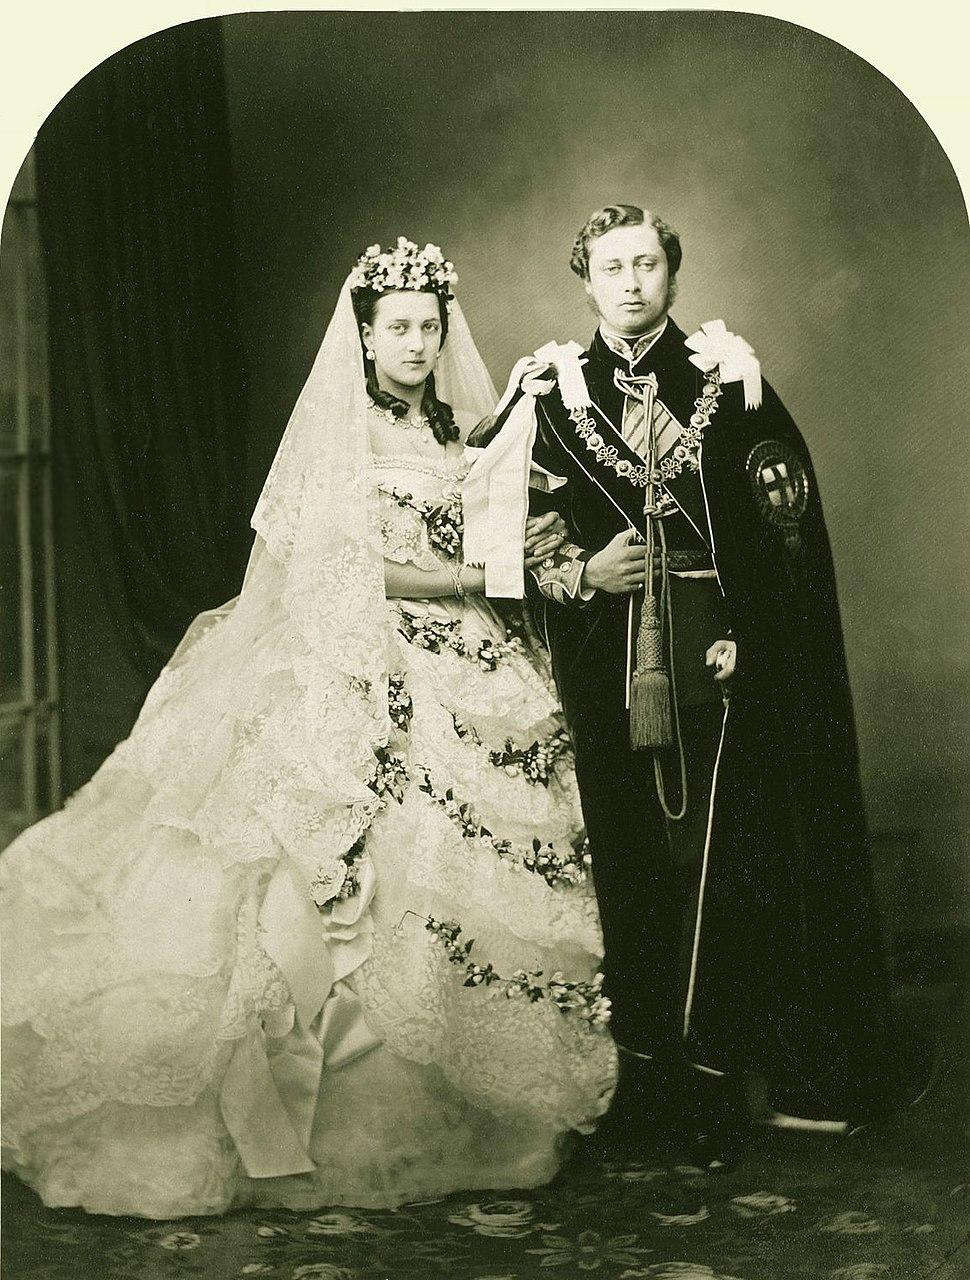 Wedding of Albert Edward Prince of Wales and Alexandra of Denmark 1863